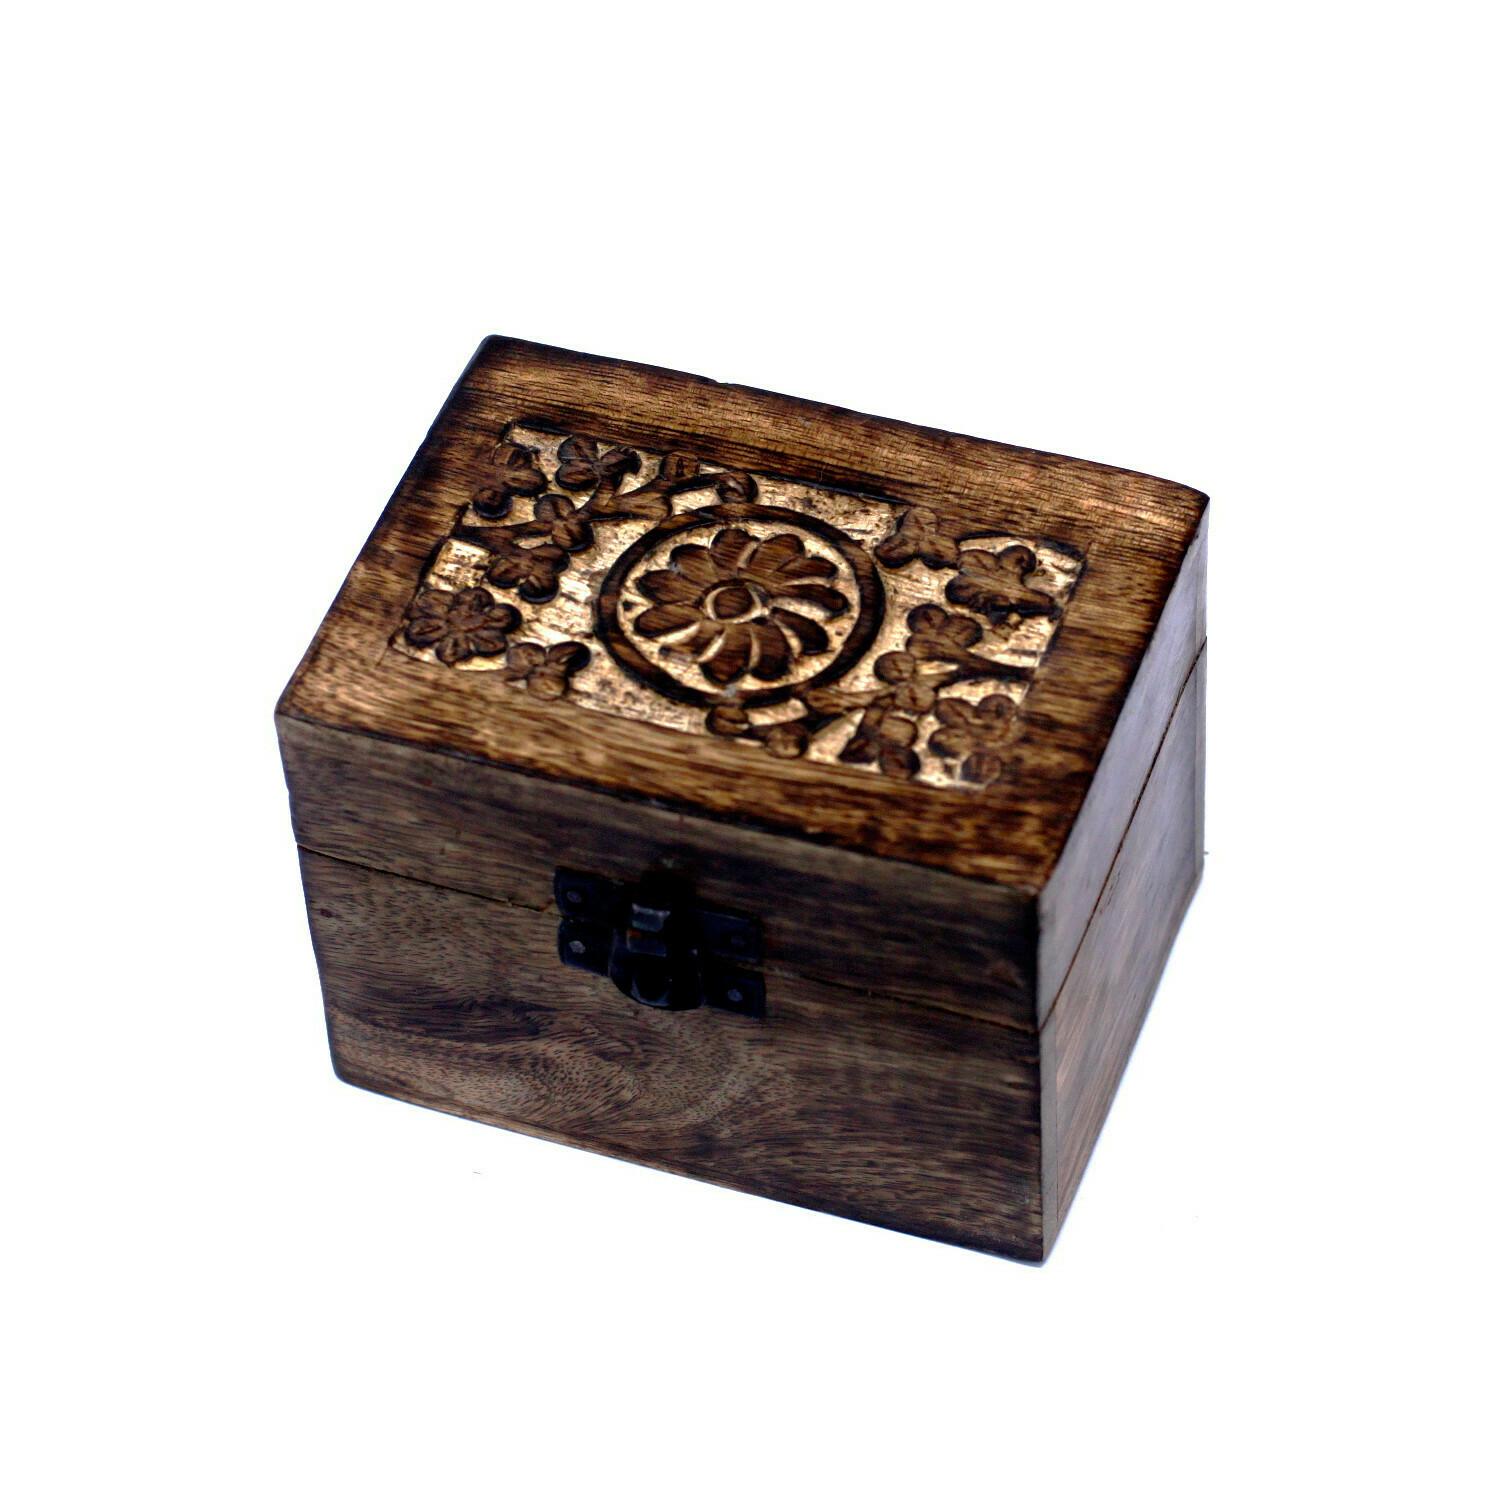 Aromatherapy Box For 10ml Oil Bottles